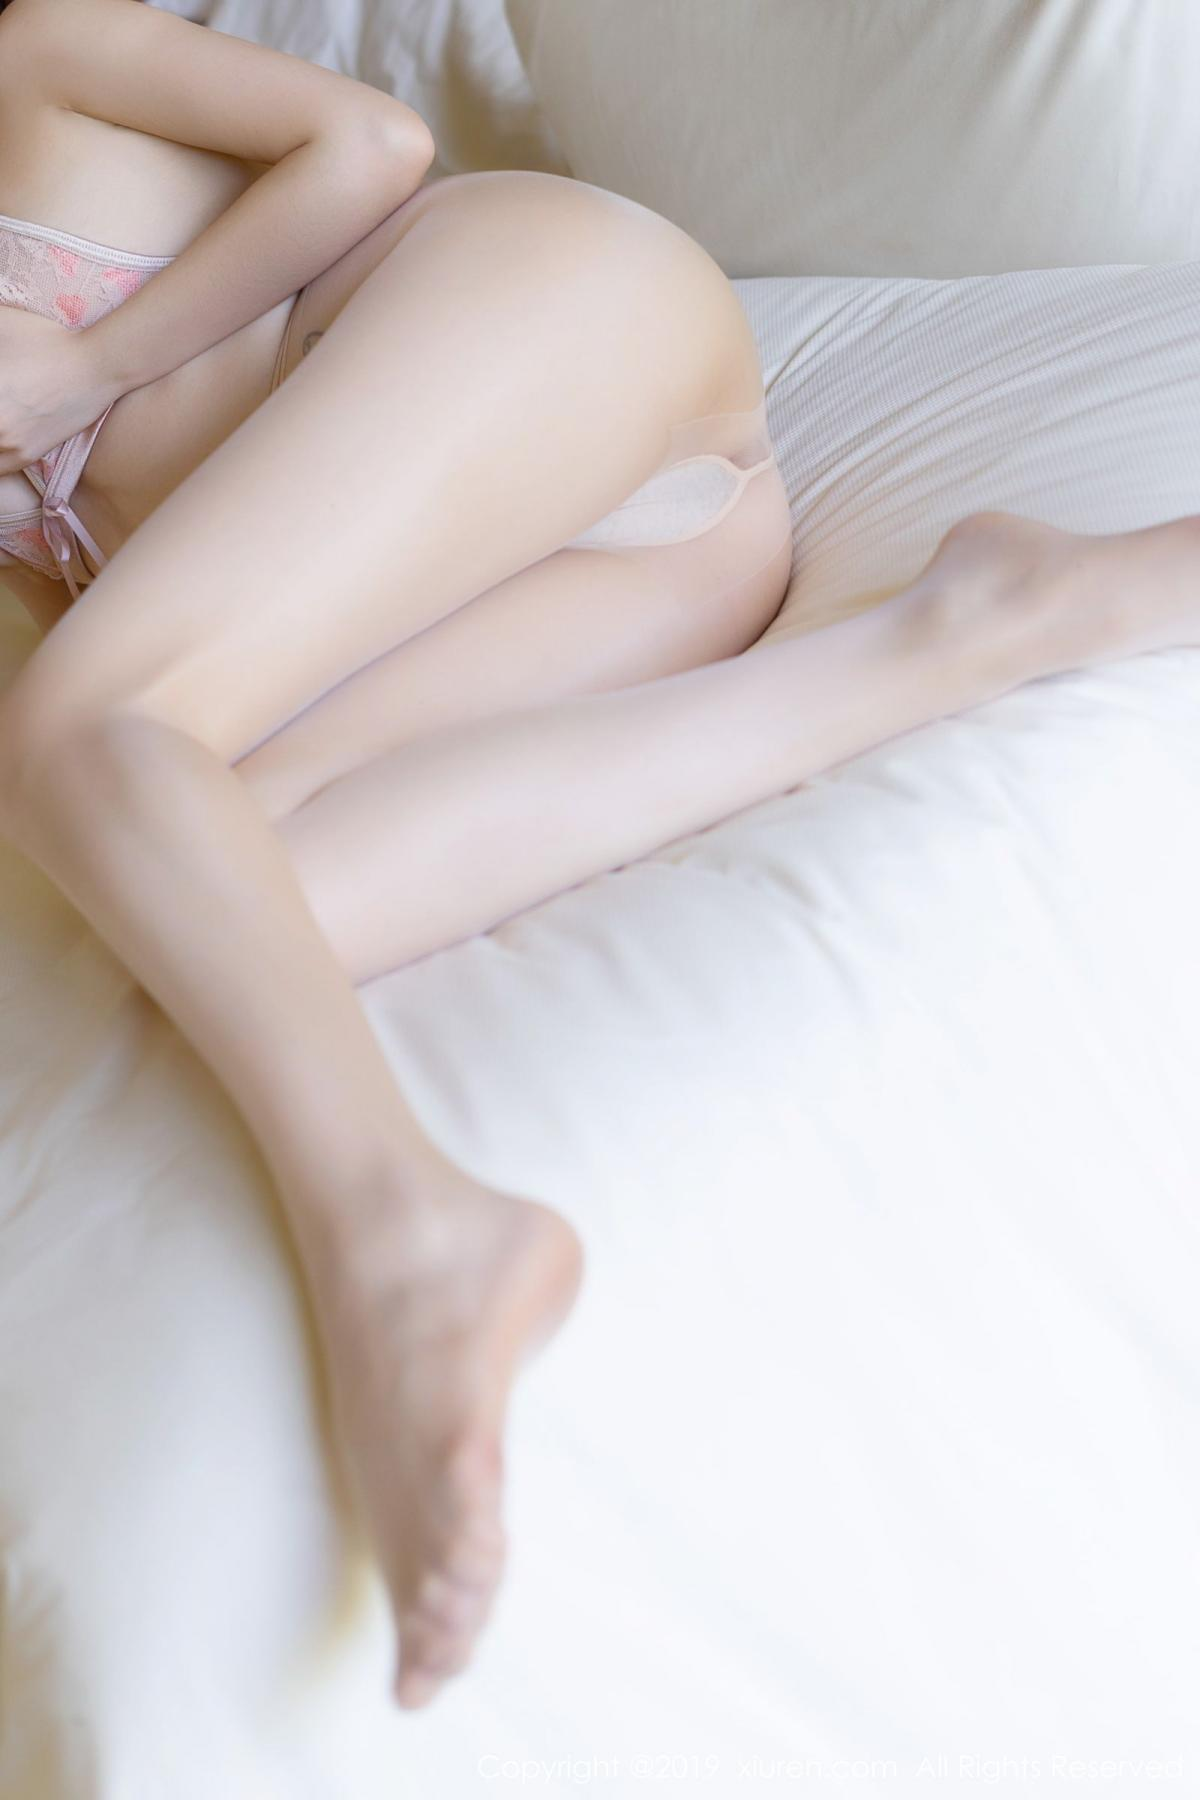 [XiuRen] Vol.1671 Huang Le Ran 15P, Adult, Huang Le Ran, Underwear, Xiuren